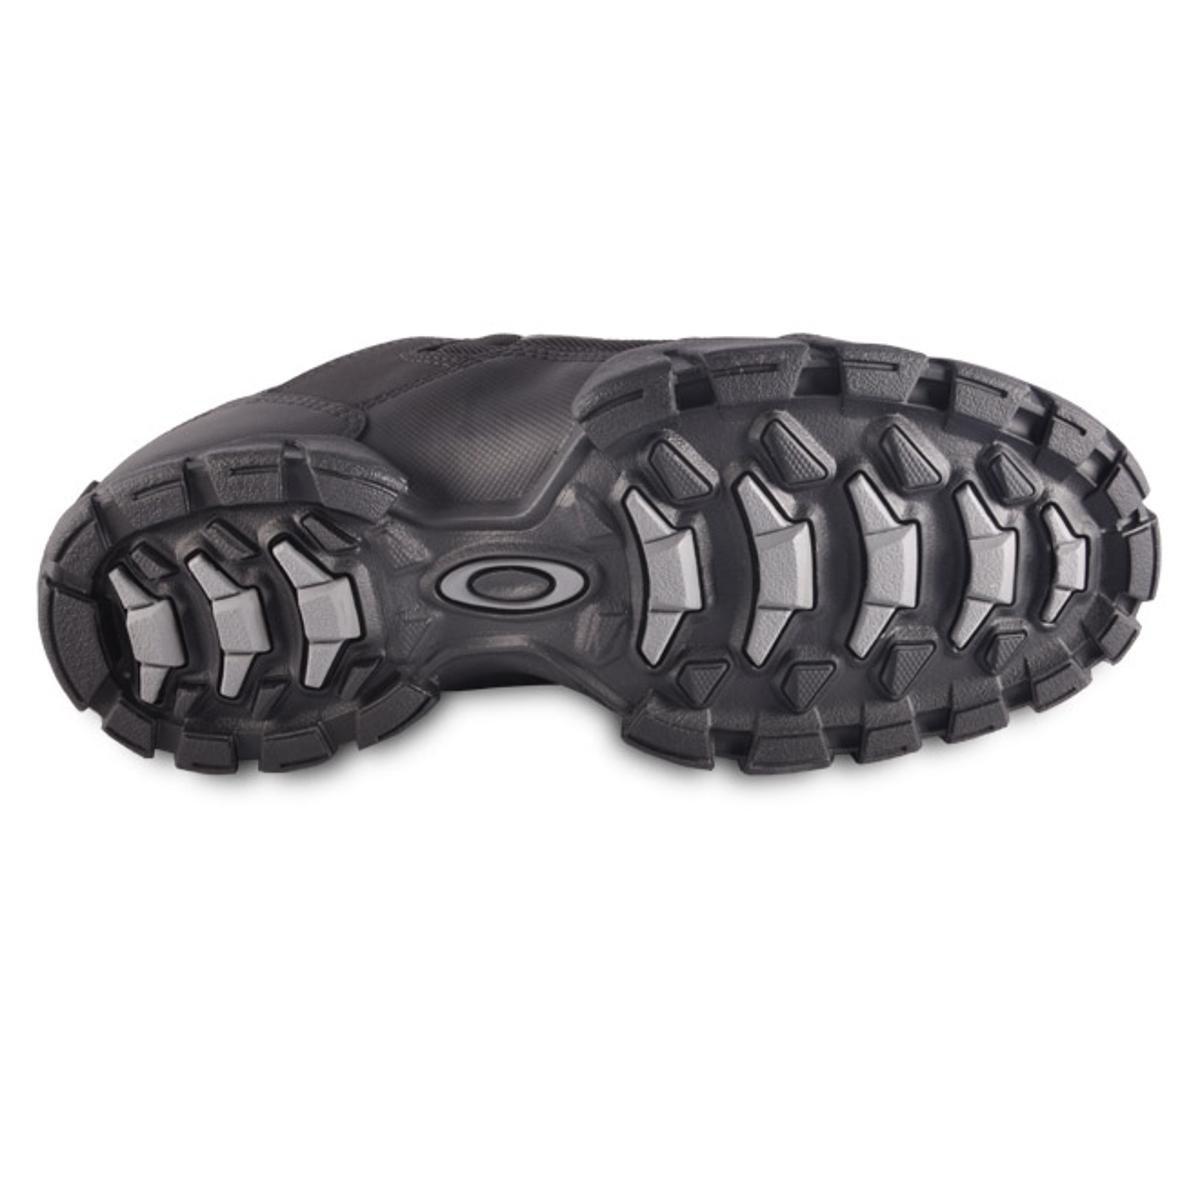 Tênis Oakley Halftrack Low - Preto - Compre Agora   Netshoes e0d3902ec3